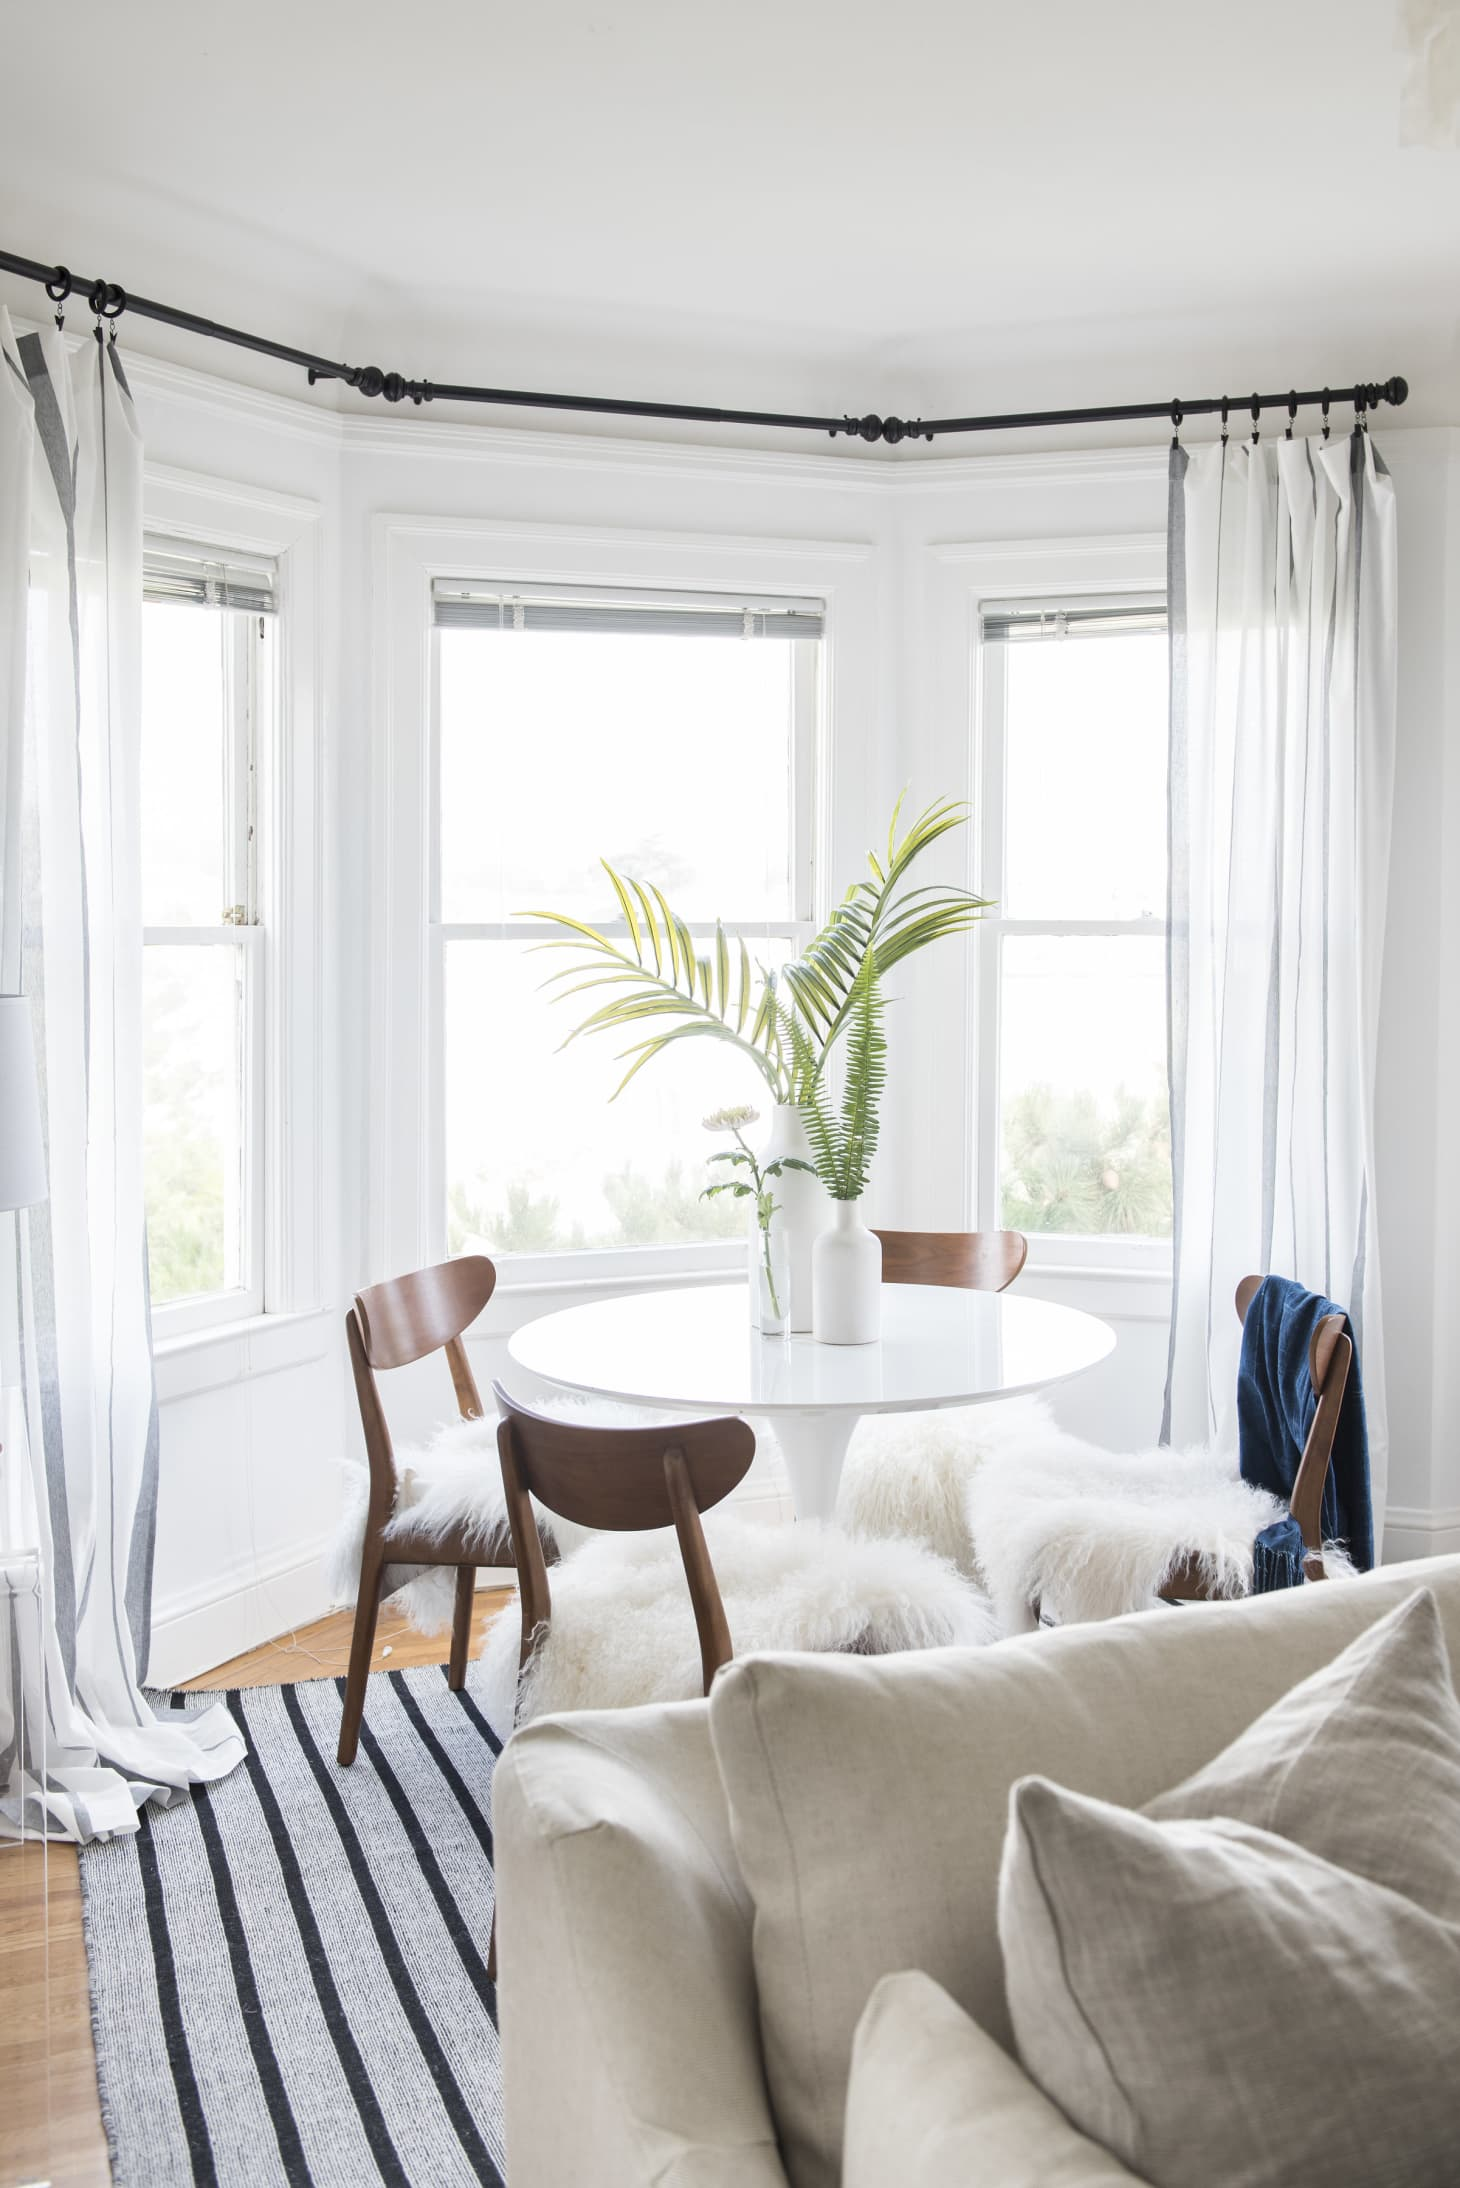 Stylish Curtain & Window Treatment Ideas | Apartment Therapy